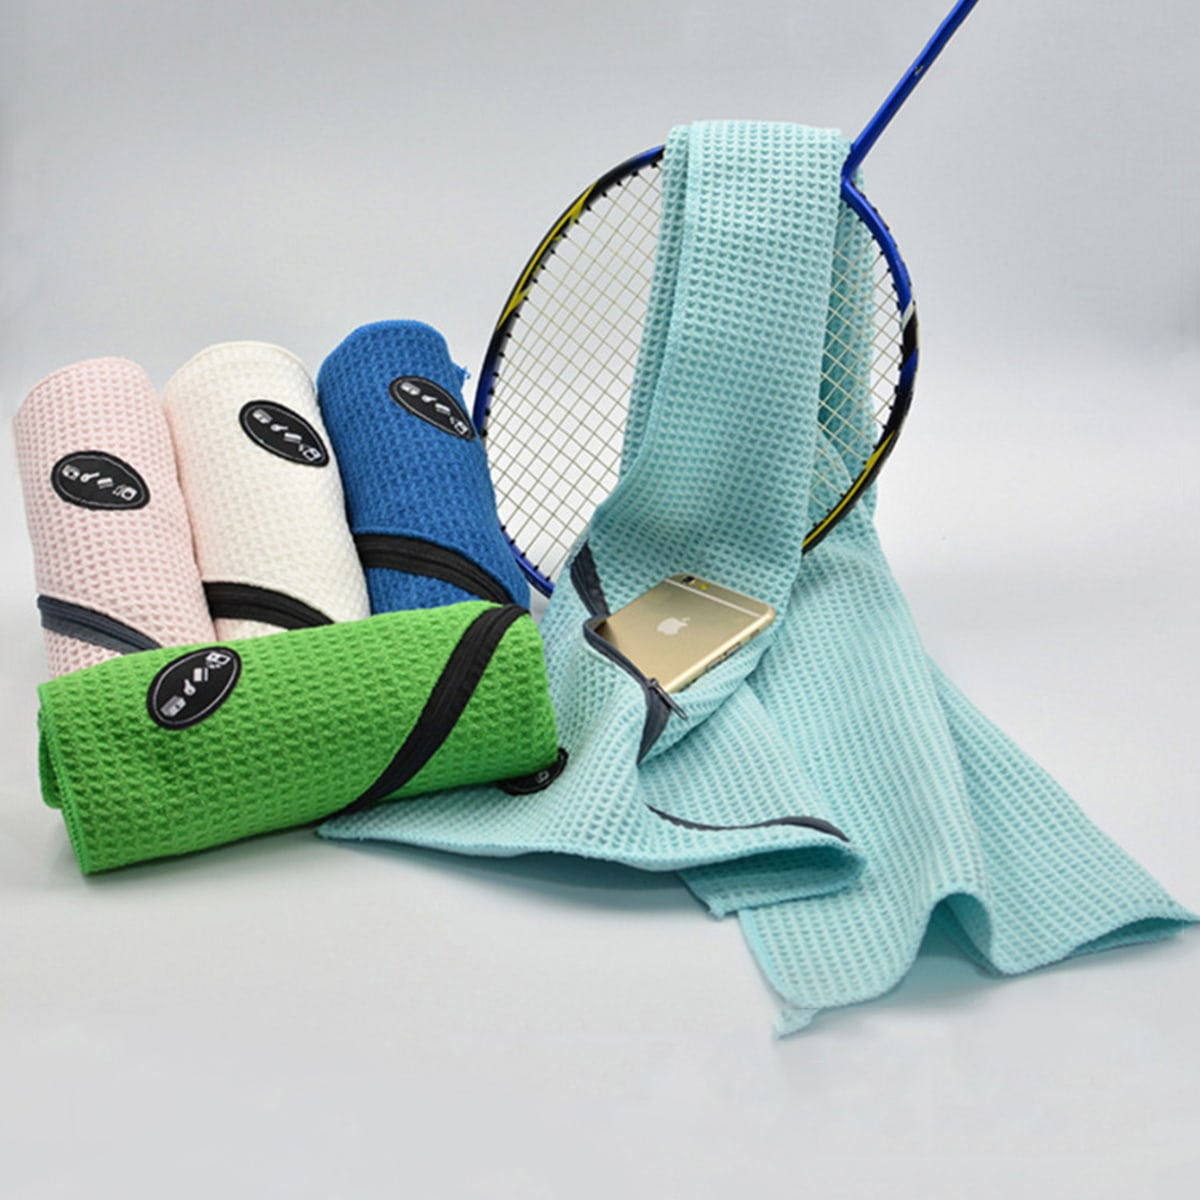 1 st sport absorberende handdoek